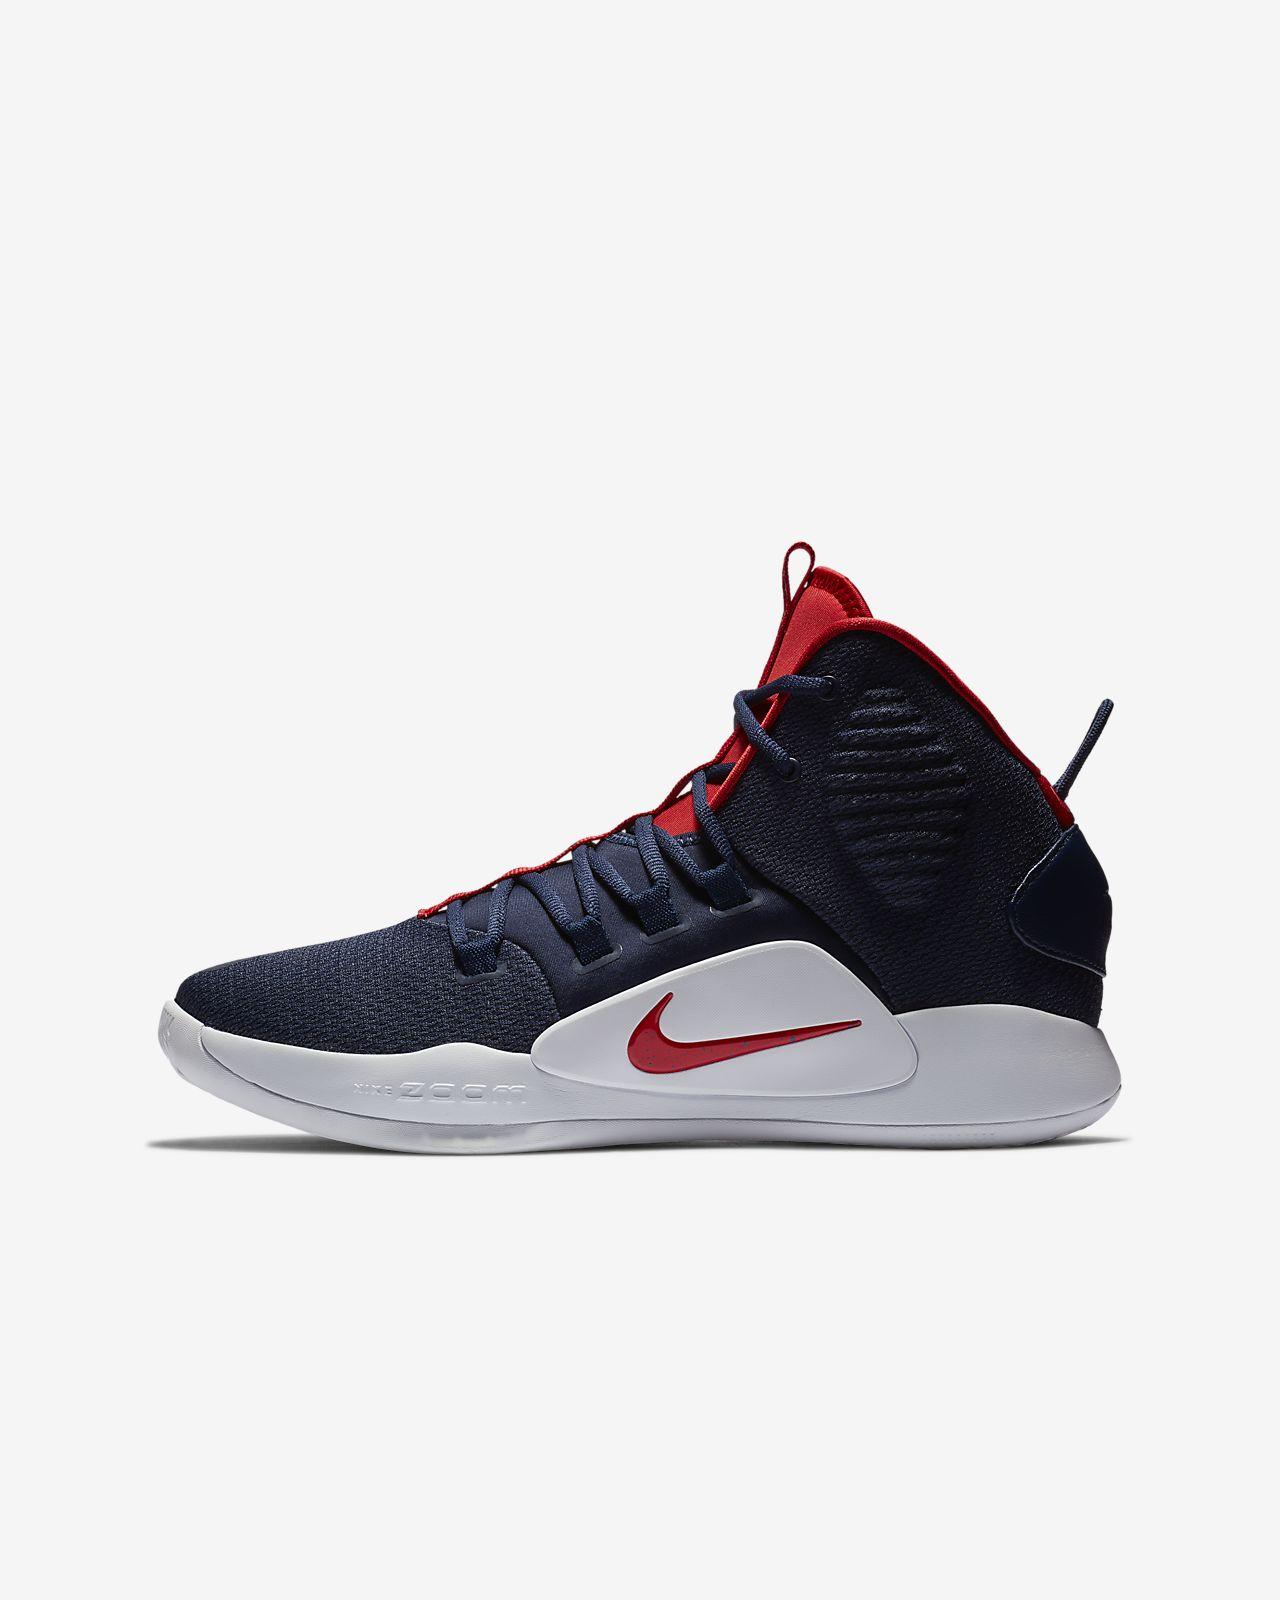 the latest 7dc04 6ec23 Nike Hyperdunk X